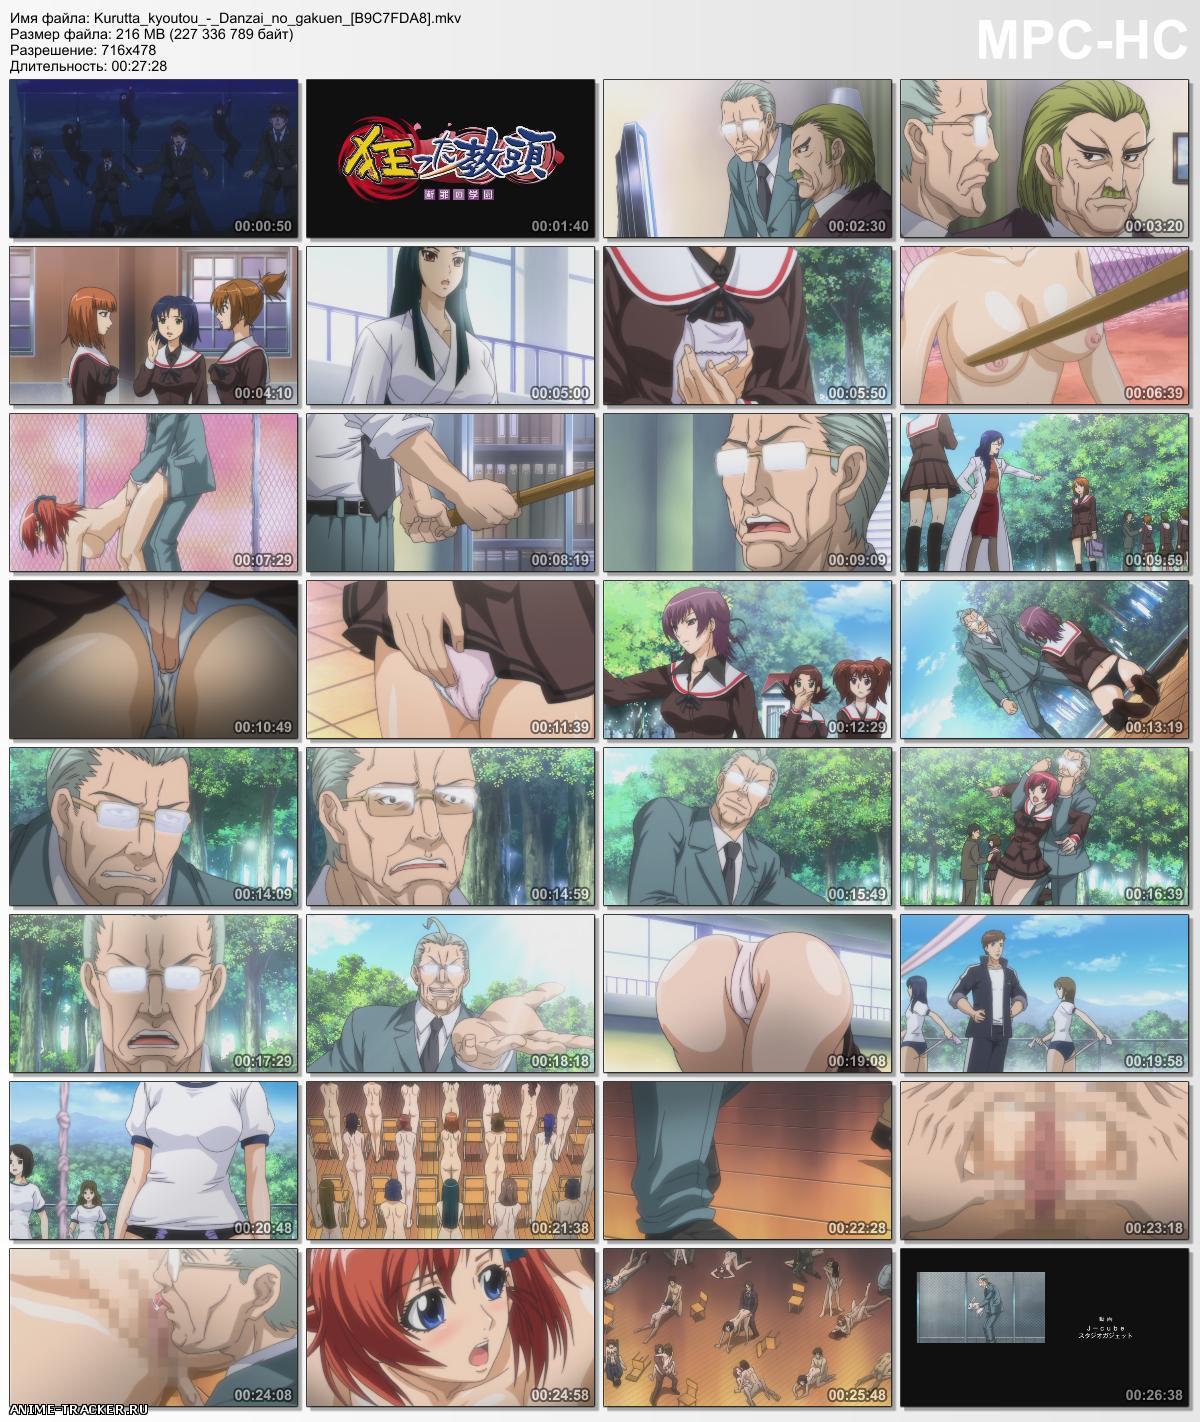 Kurutta Kyoutou: Danzai no Gakuen / Заместитель ректора: Безумная школа [1 из 1] [ENG,JAP,RUS] Anime Hentai